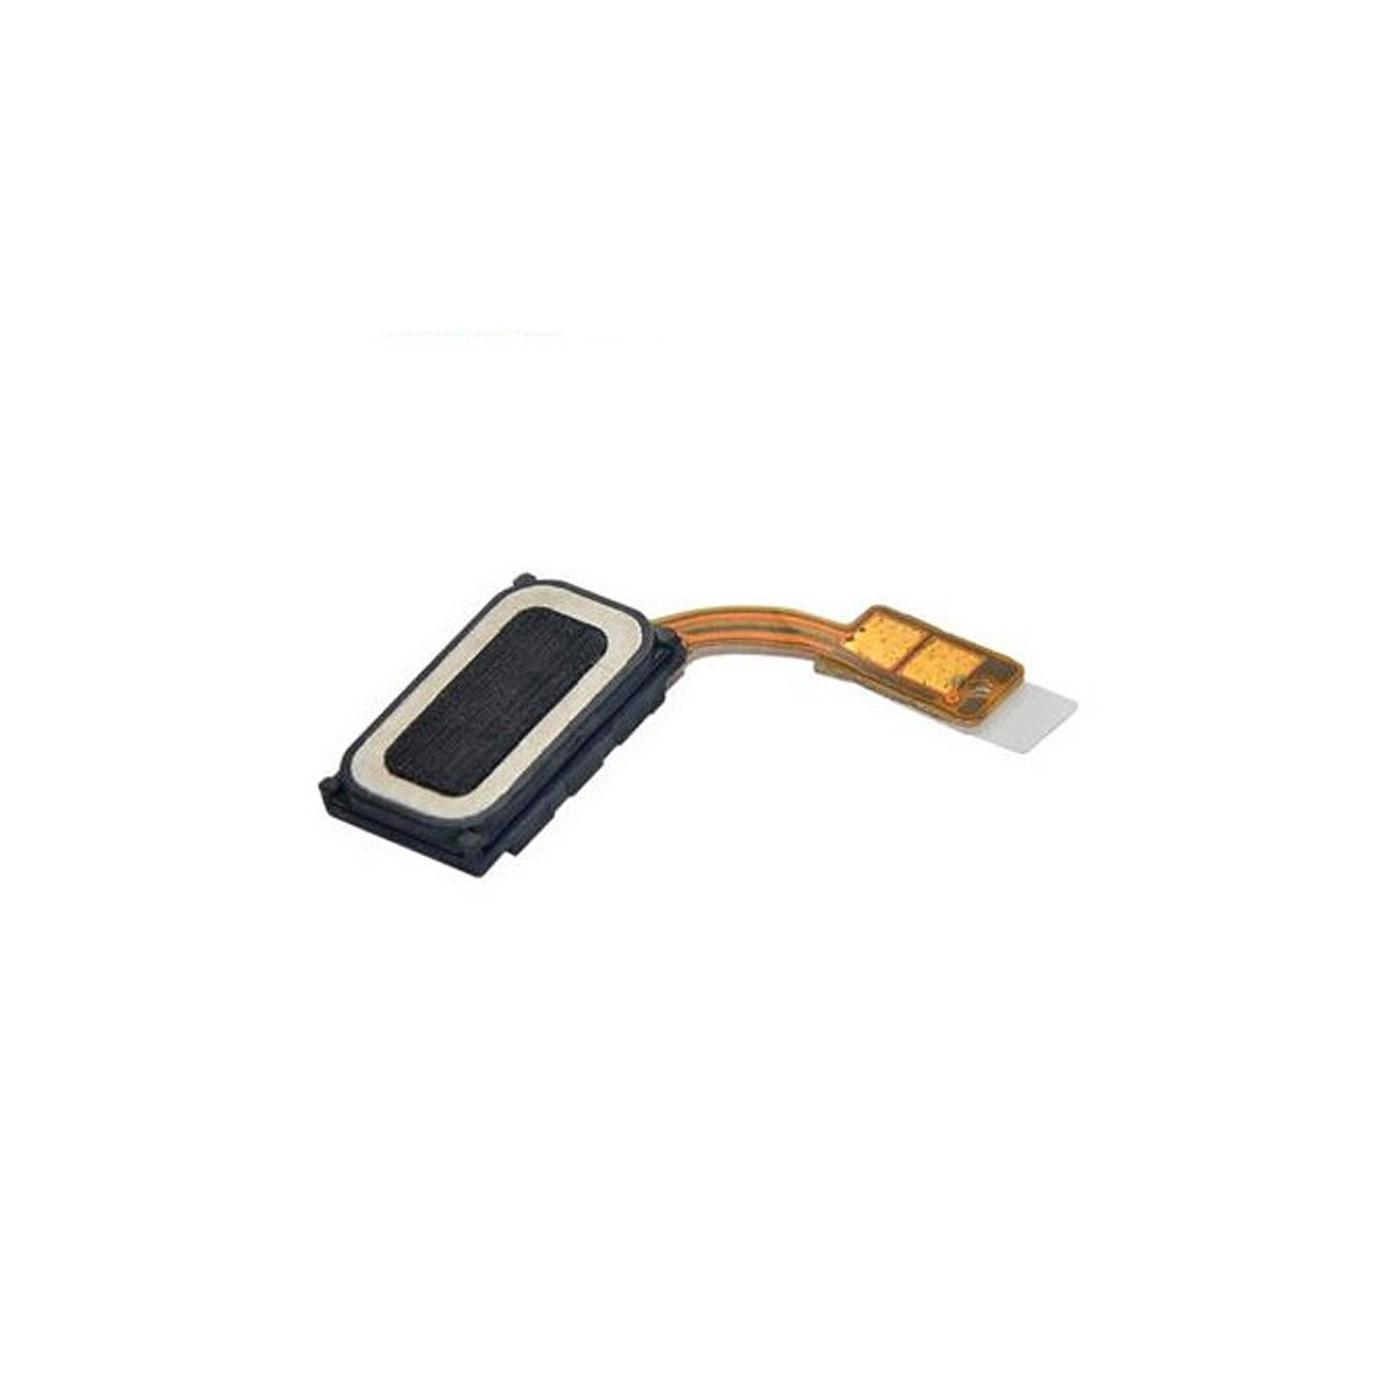 Ear Speaker for Samsung Galaxy S5 G900